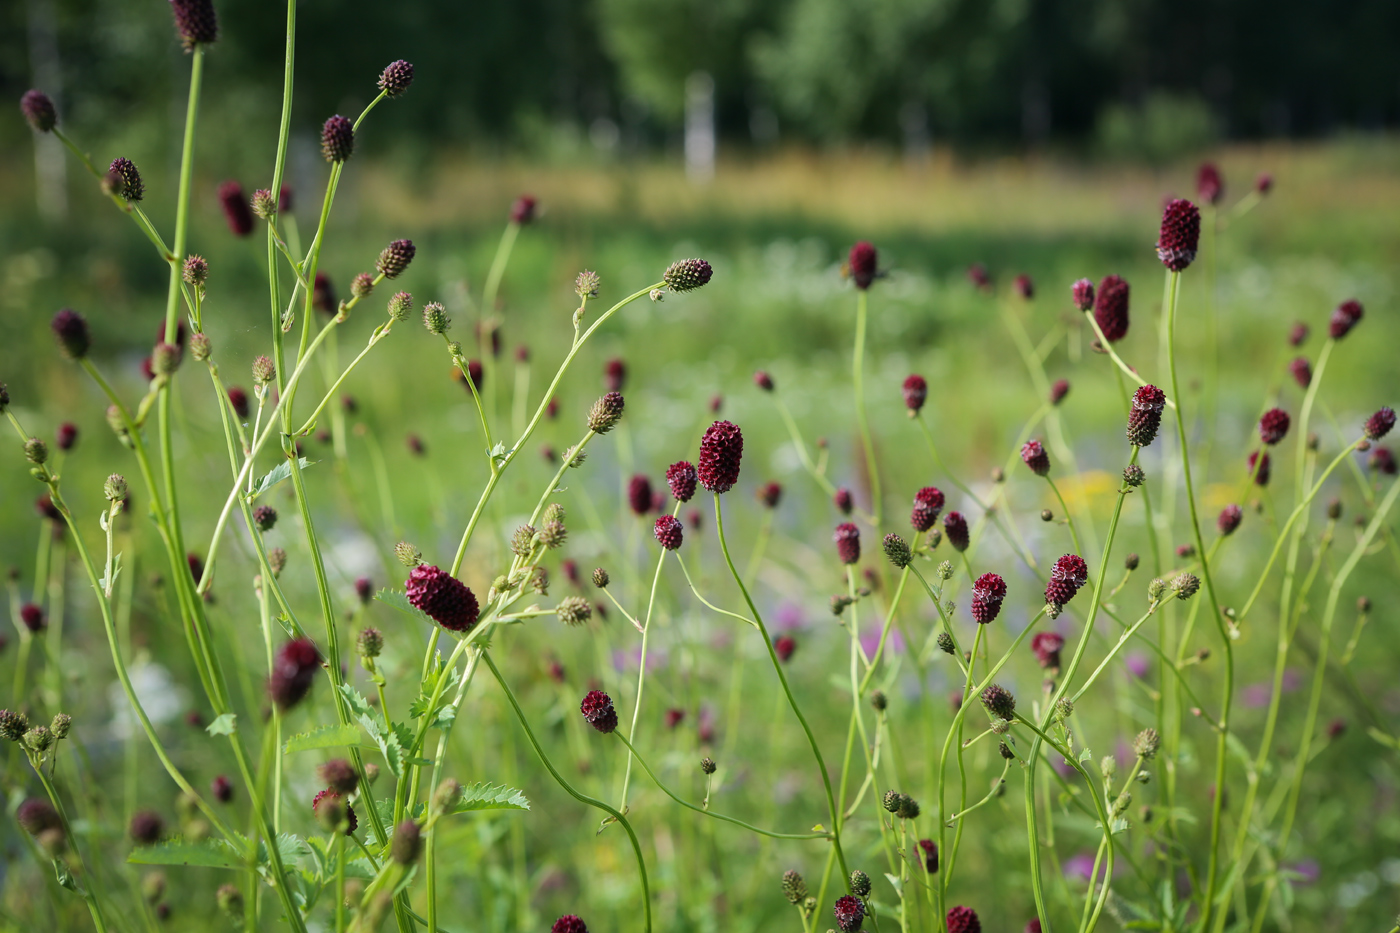 Травы в картинках пермского края